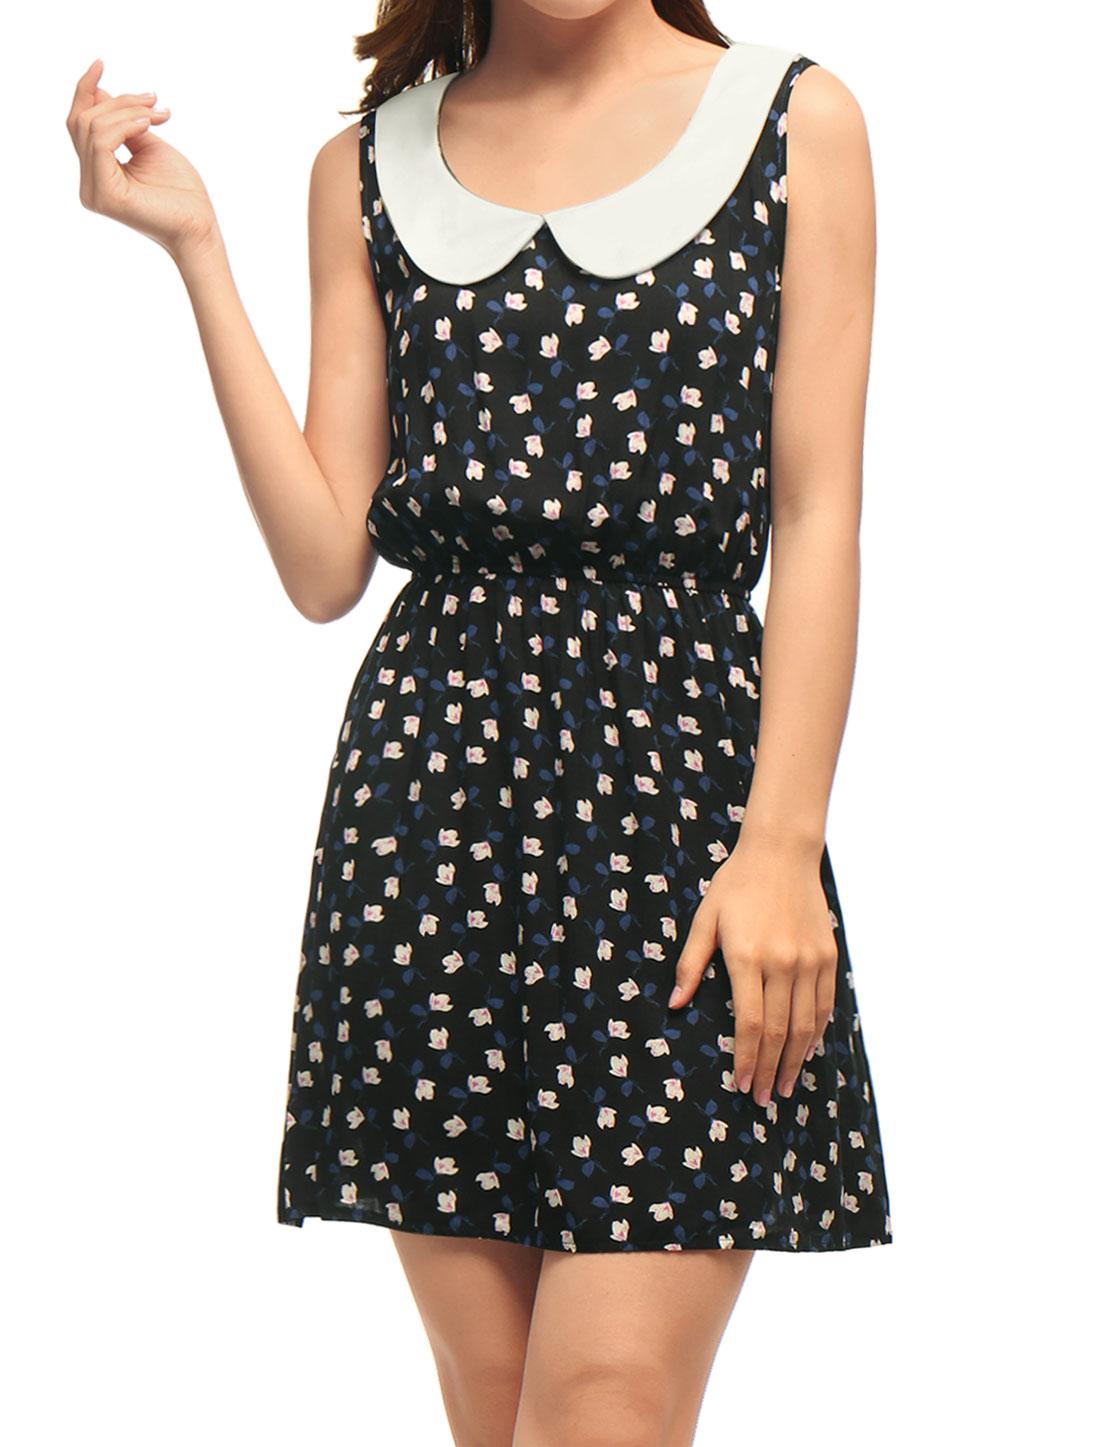 Woman Sleeveless Doll Collar Elastic Waist Flower Mini Dress Black XL